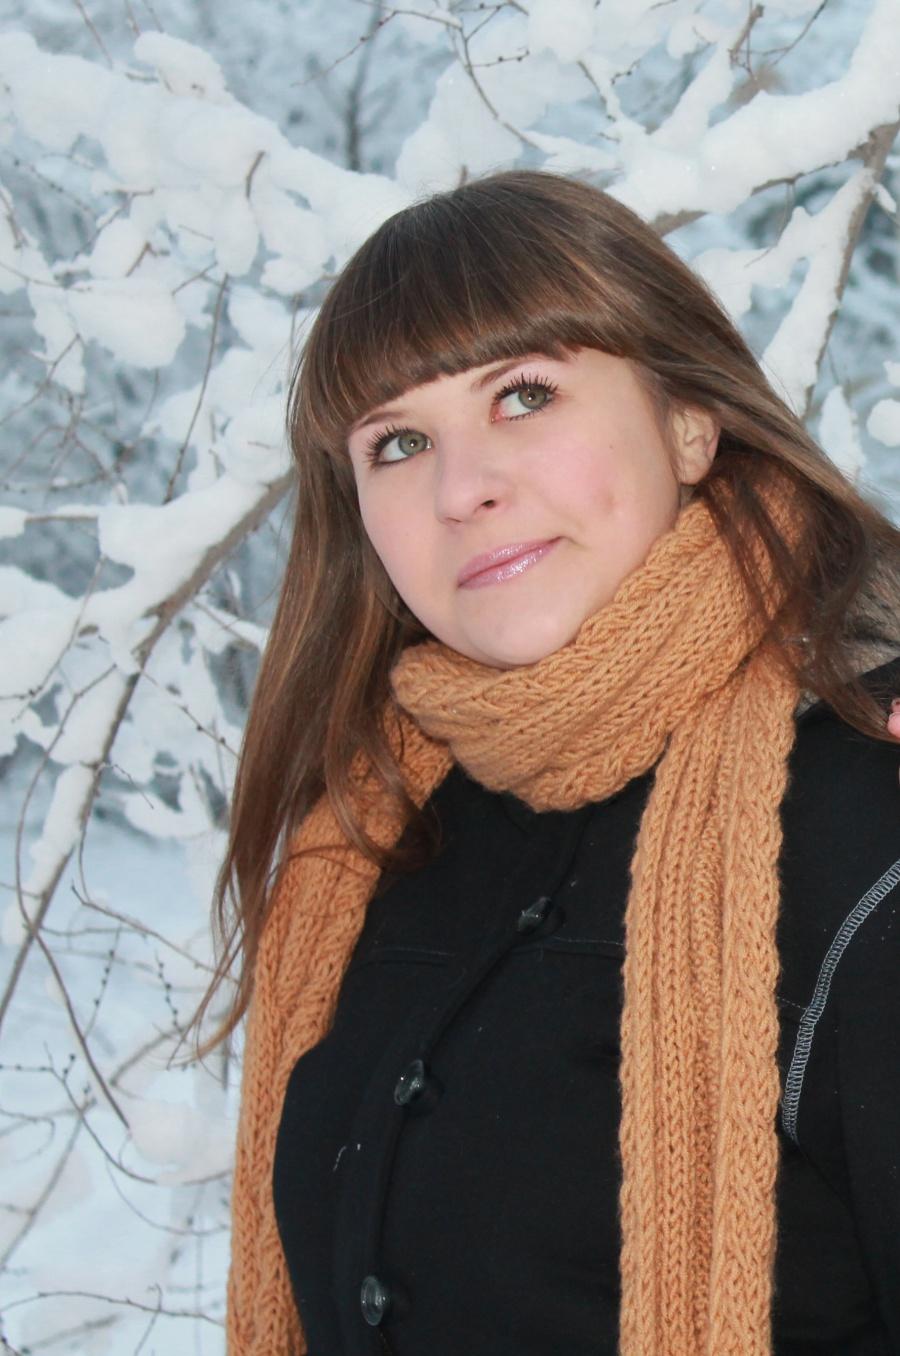 Фото девушки челябинска знакомства